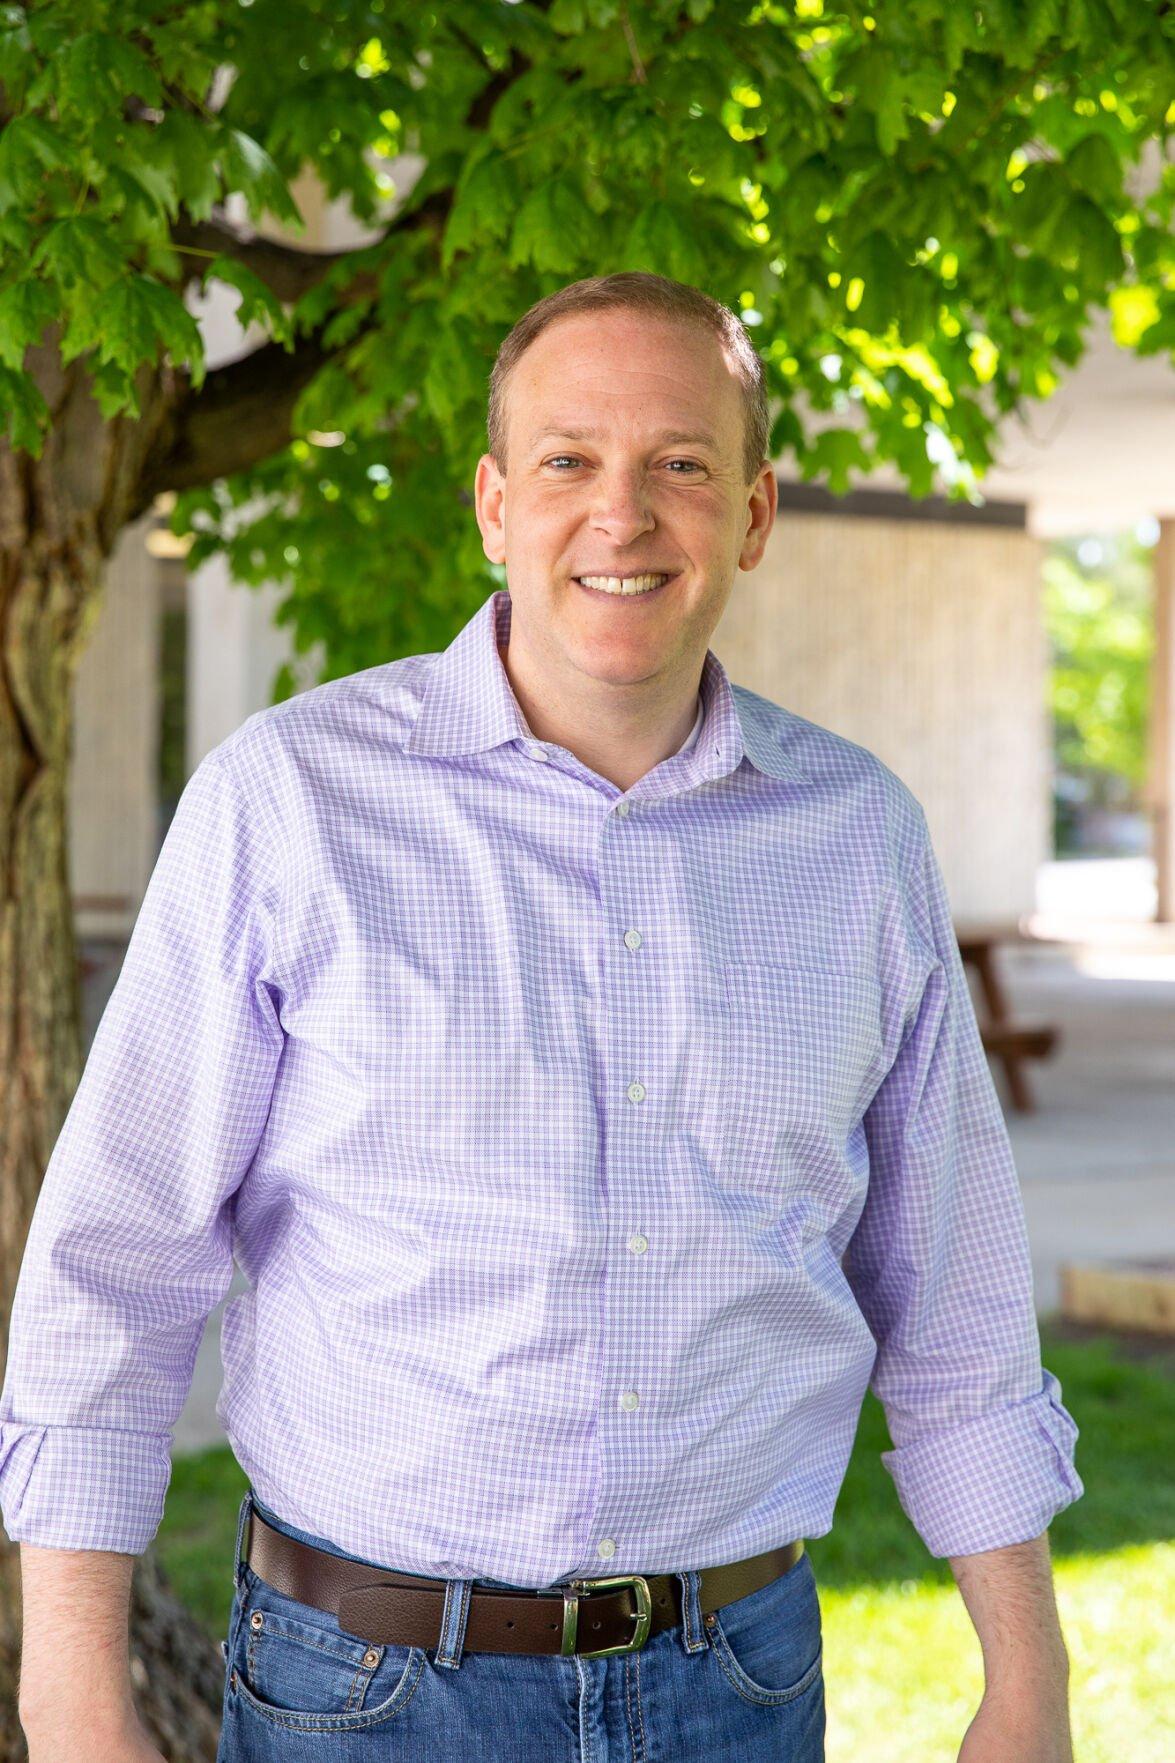 Zeldin raises $4M so far in governor's race